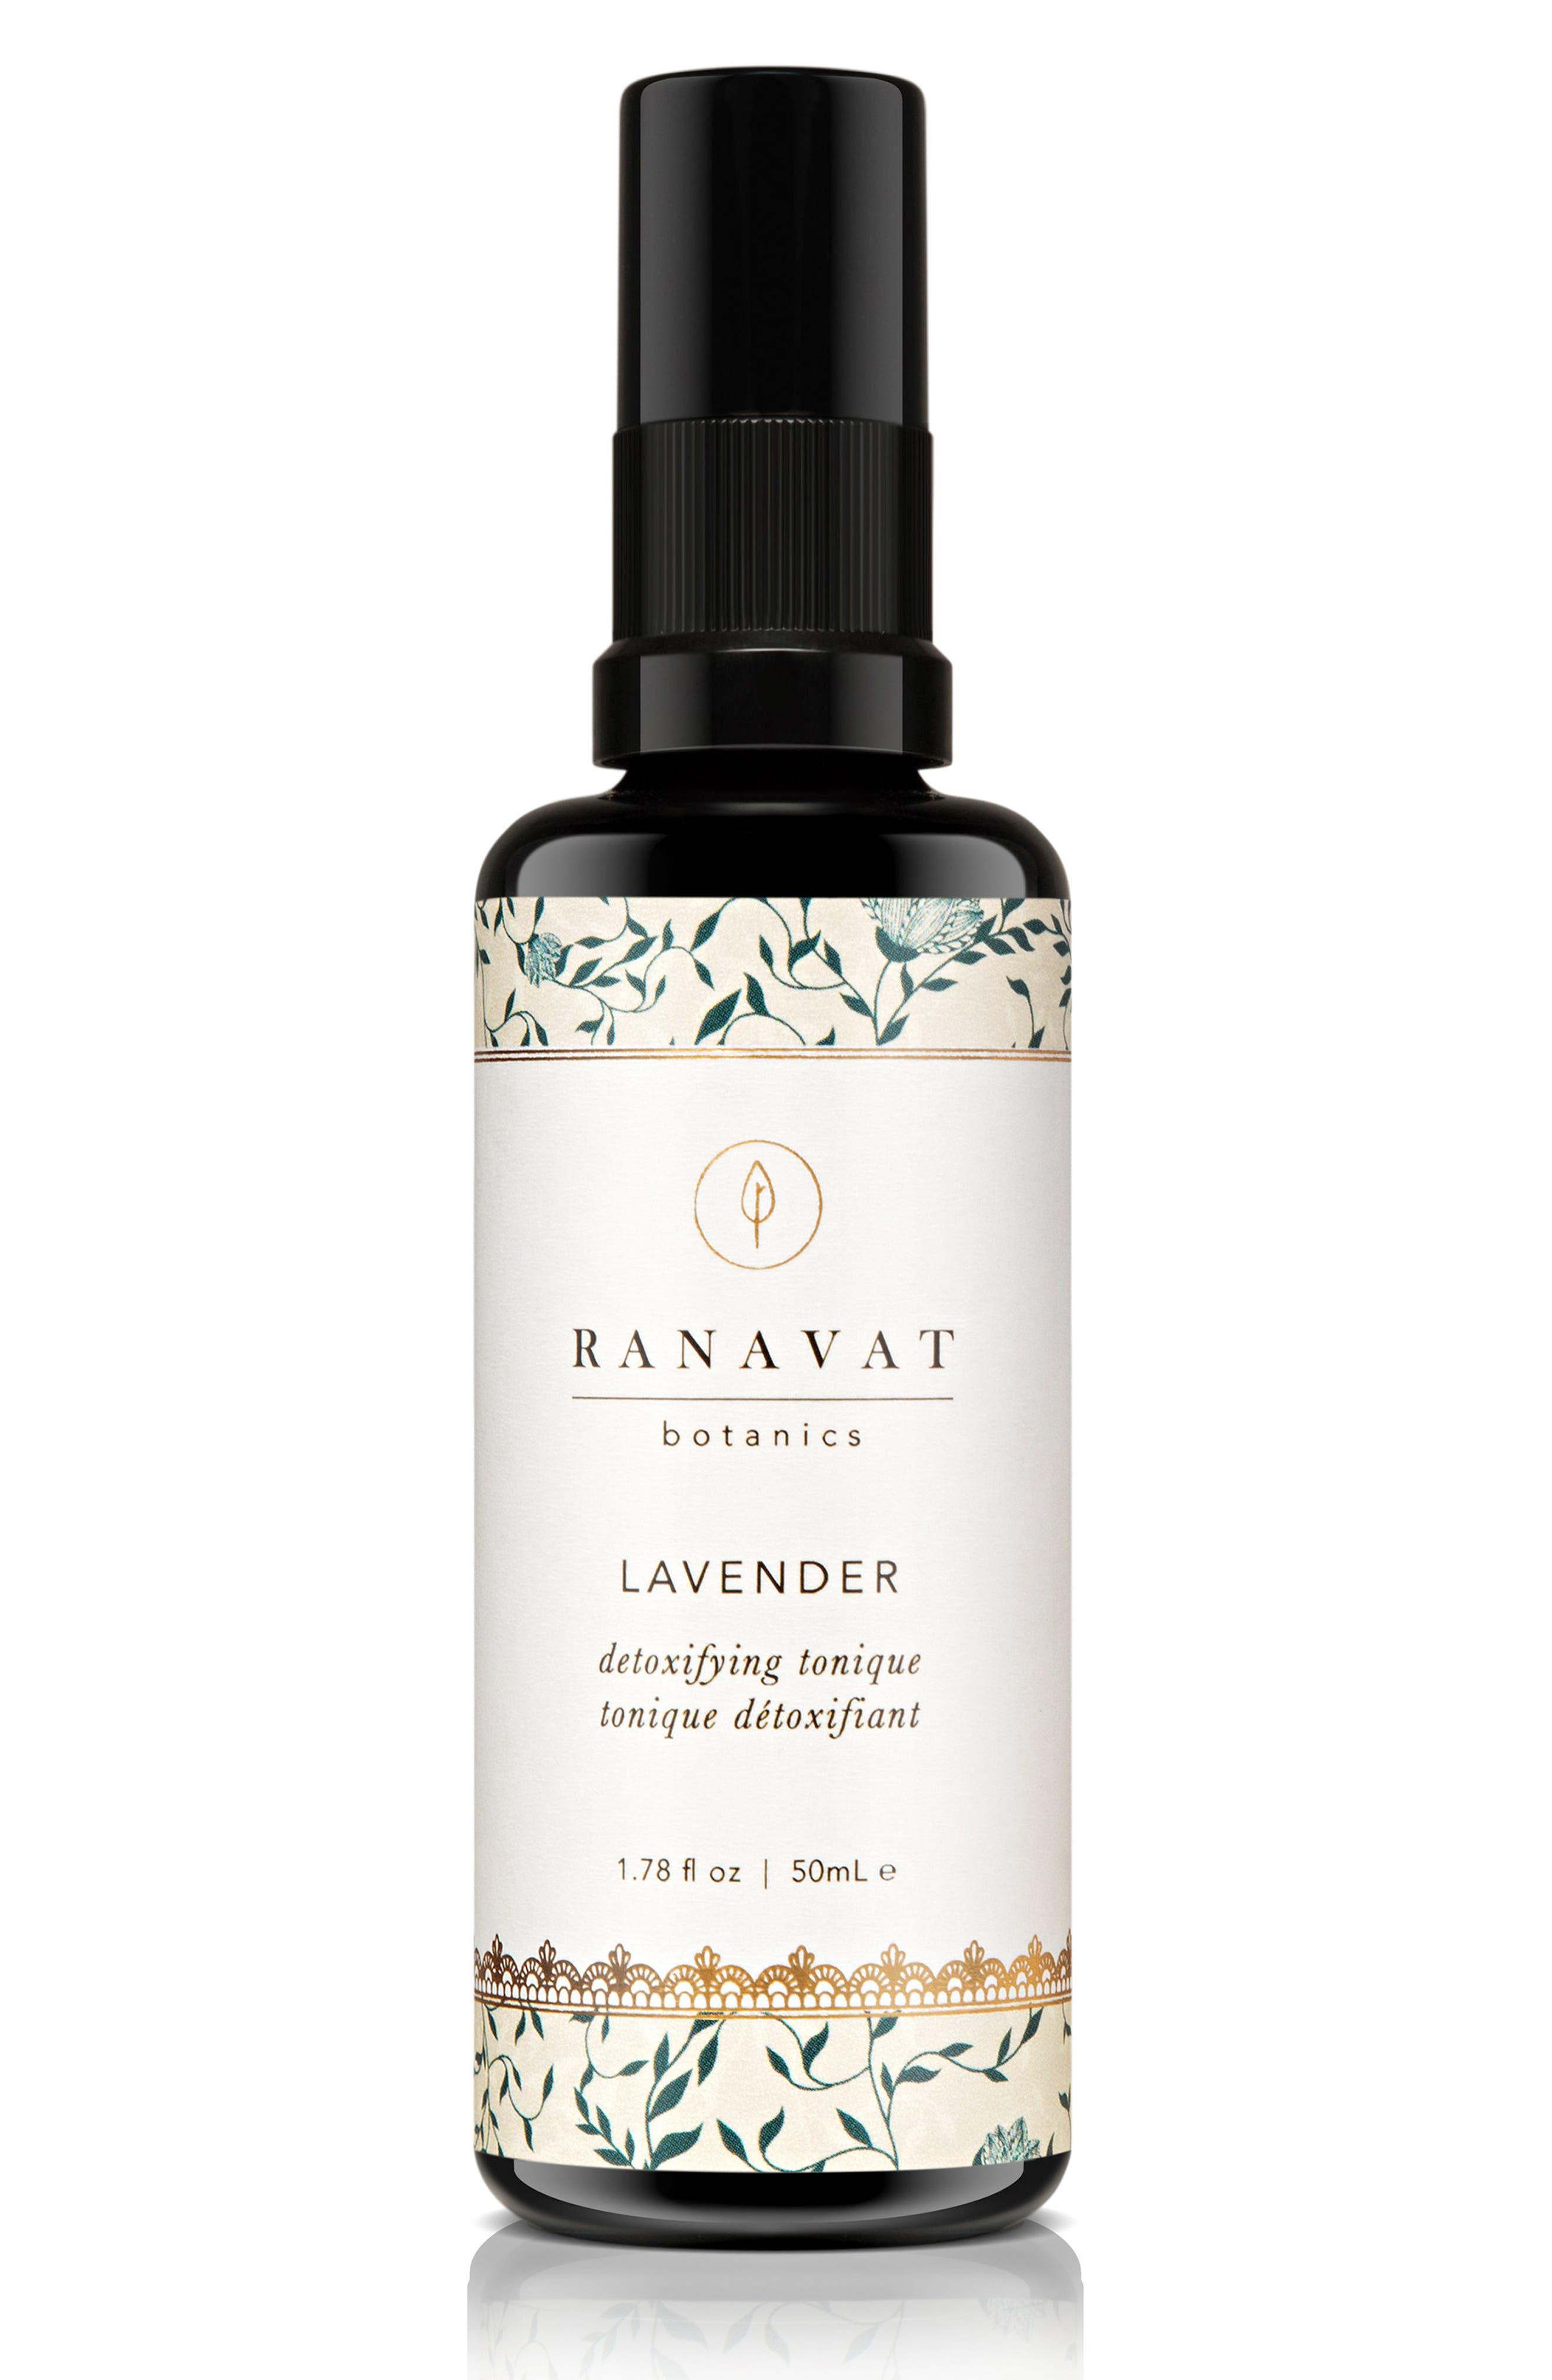 Ranavat Botanics Lavender Detoxifying Tonique